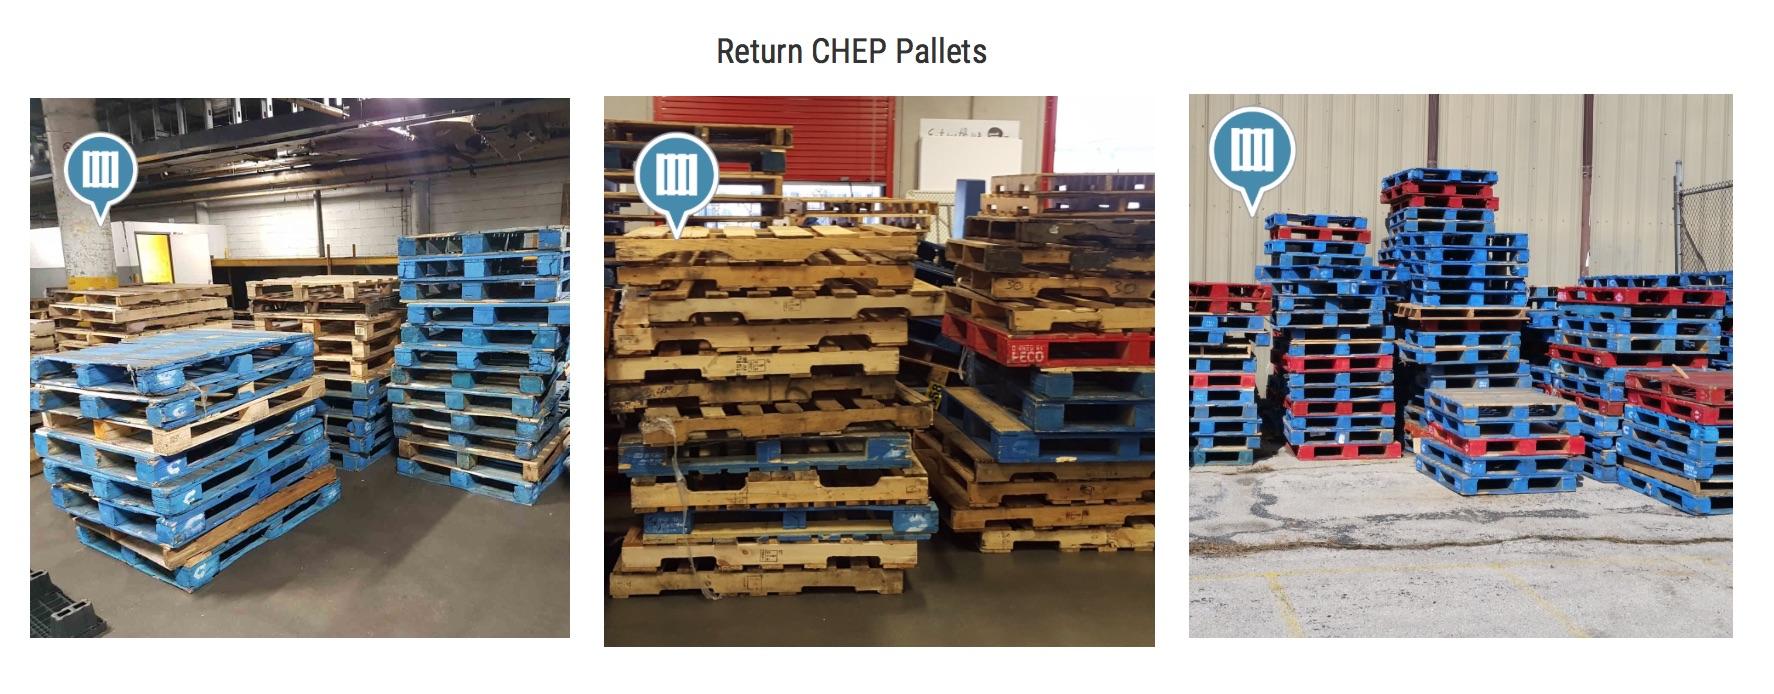 Return CHEP Pallets